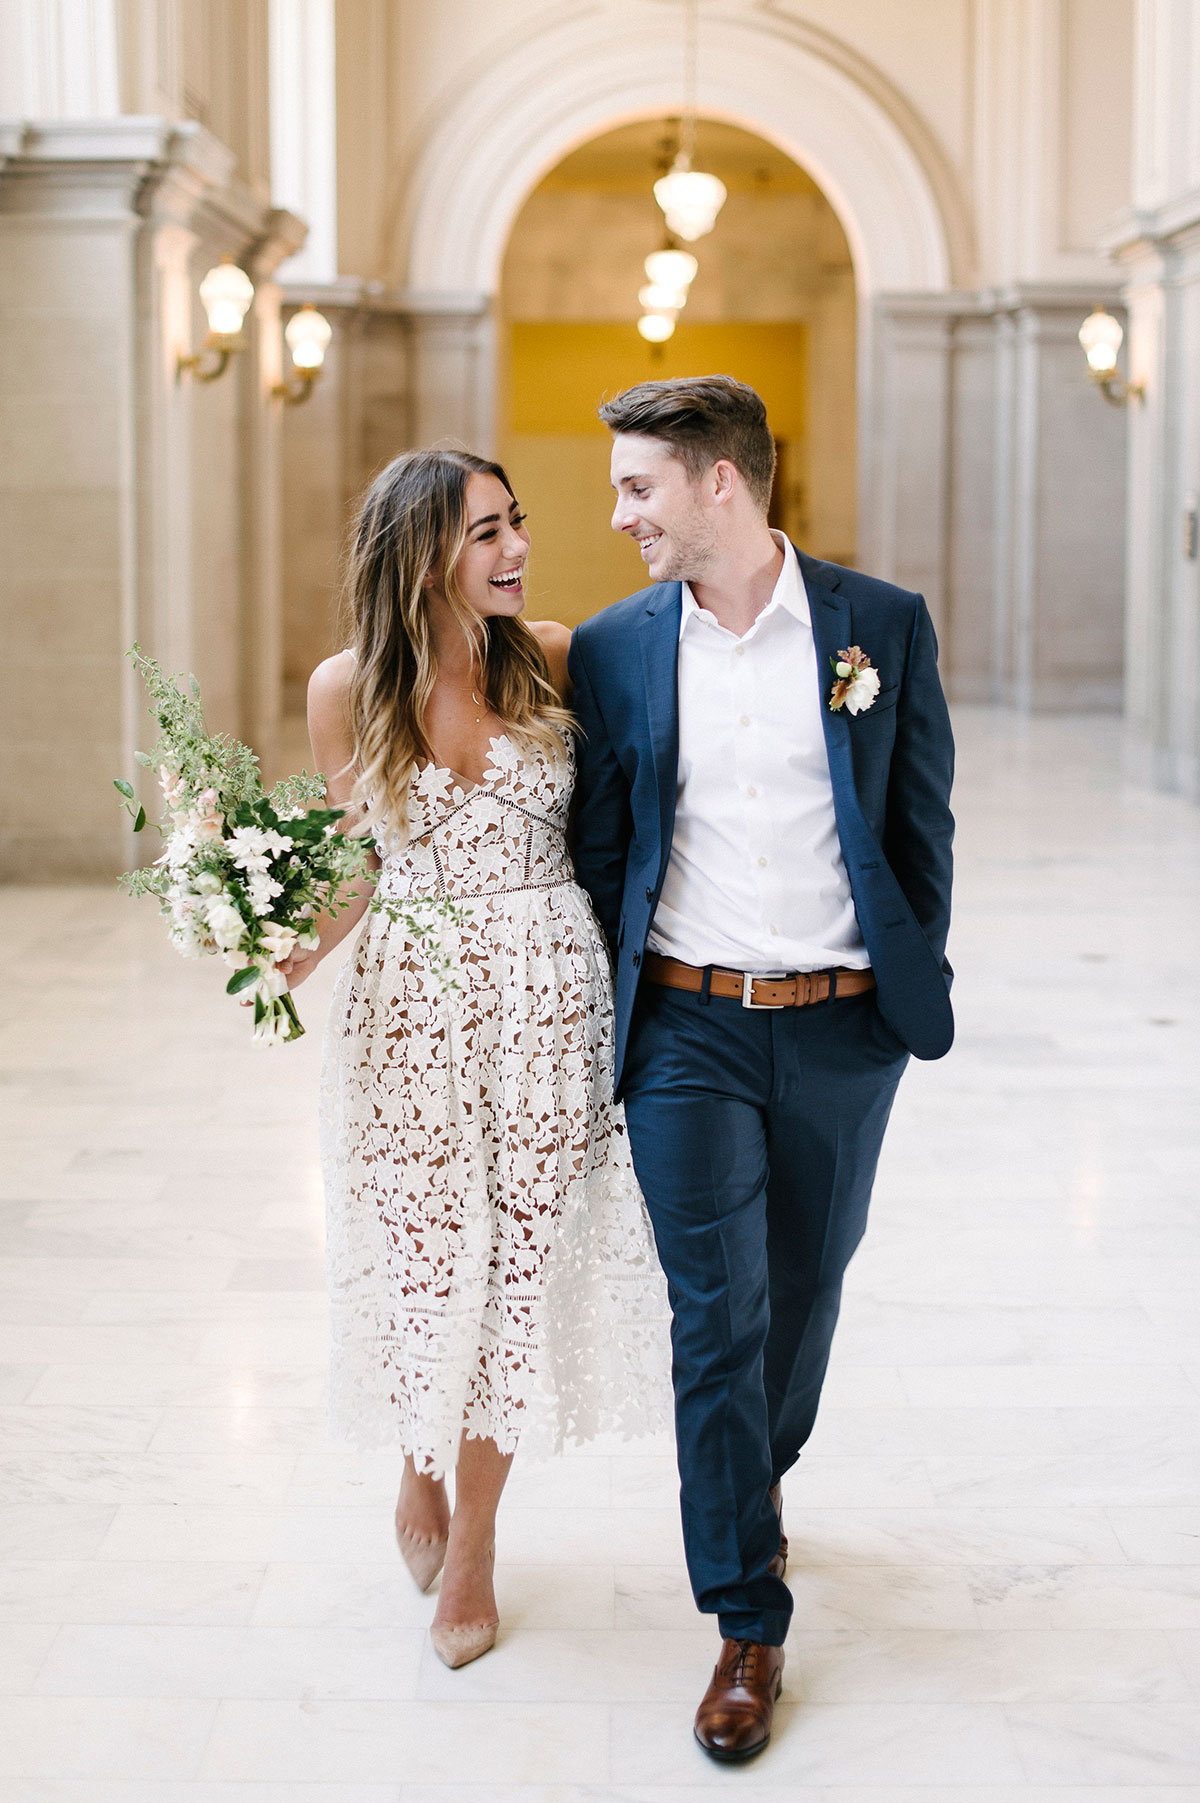 suknia ślubna na ślub cywilny, suknia na ślub, sukienka ślubna, jaka suknia na ślub cywilny, suknia ślubna, ubiór panny młodej, trendy 2019, suknie ślubne 2019, panna młoda